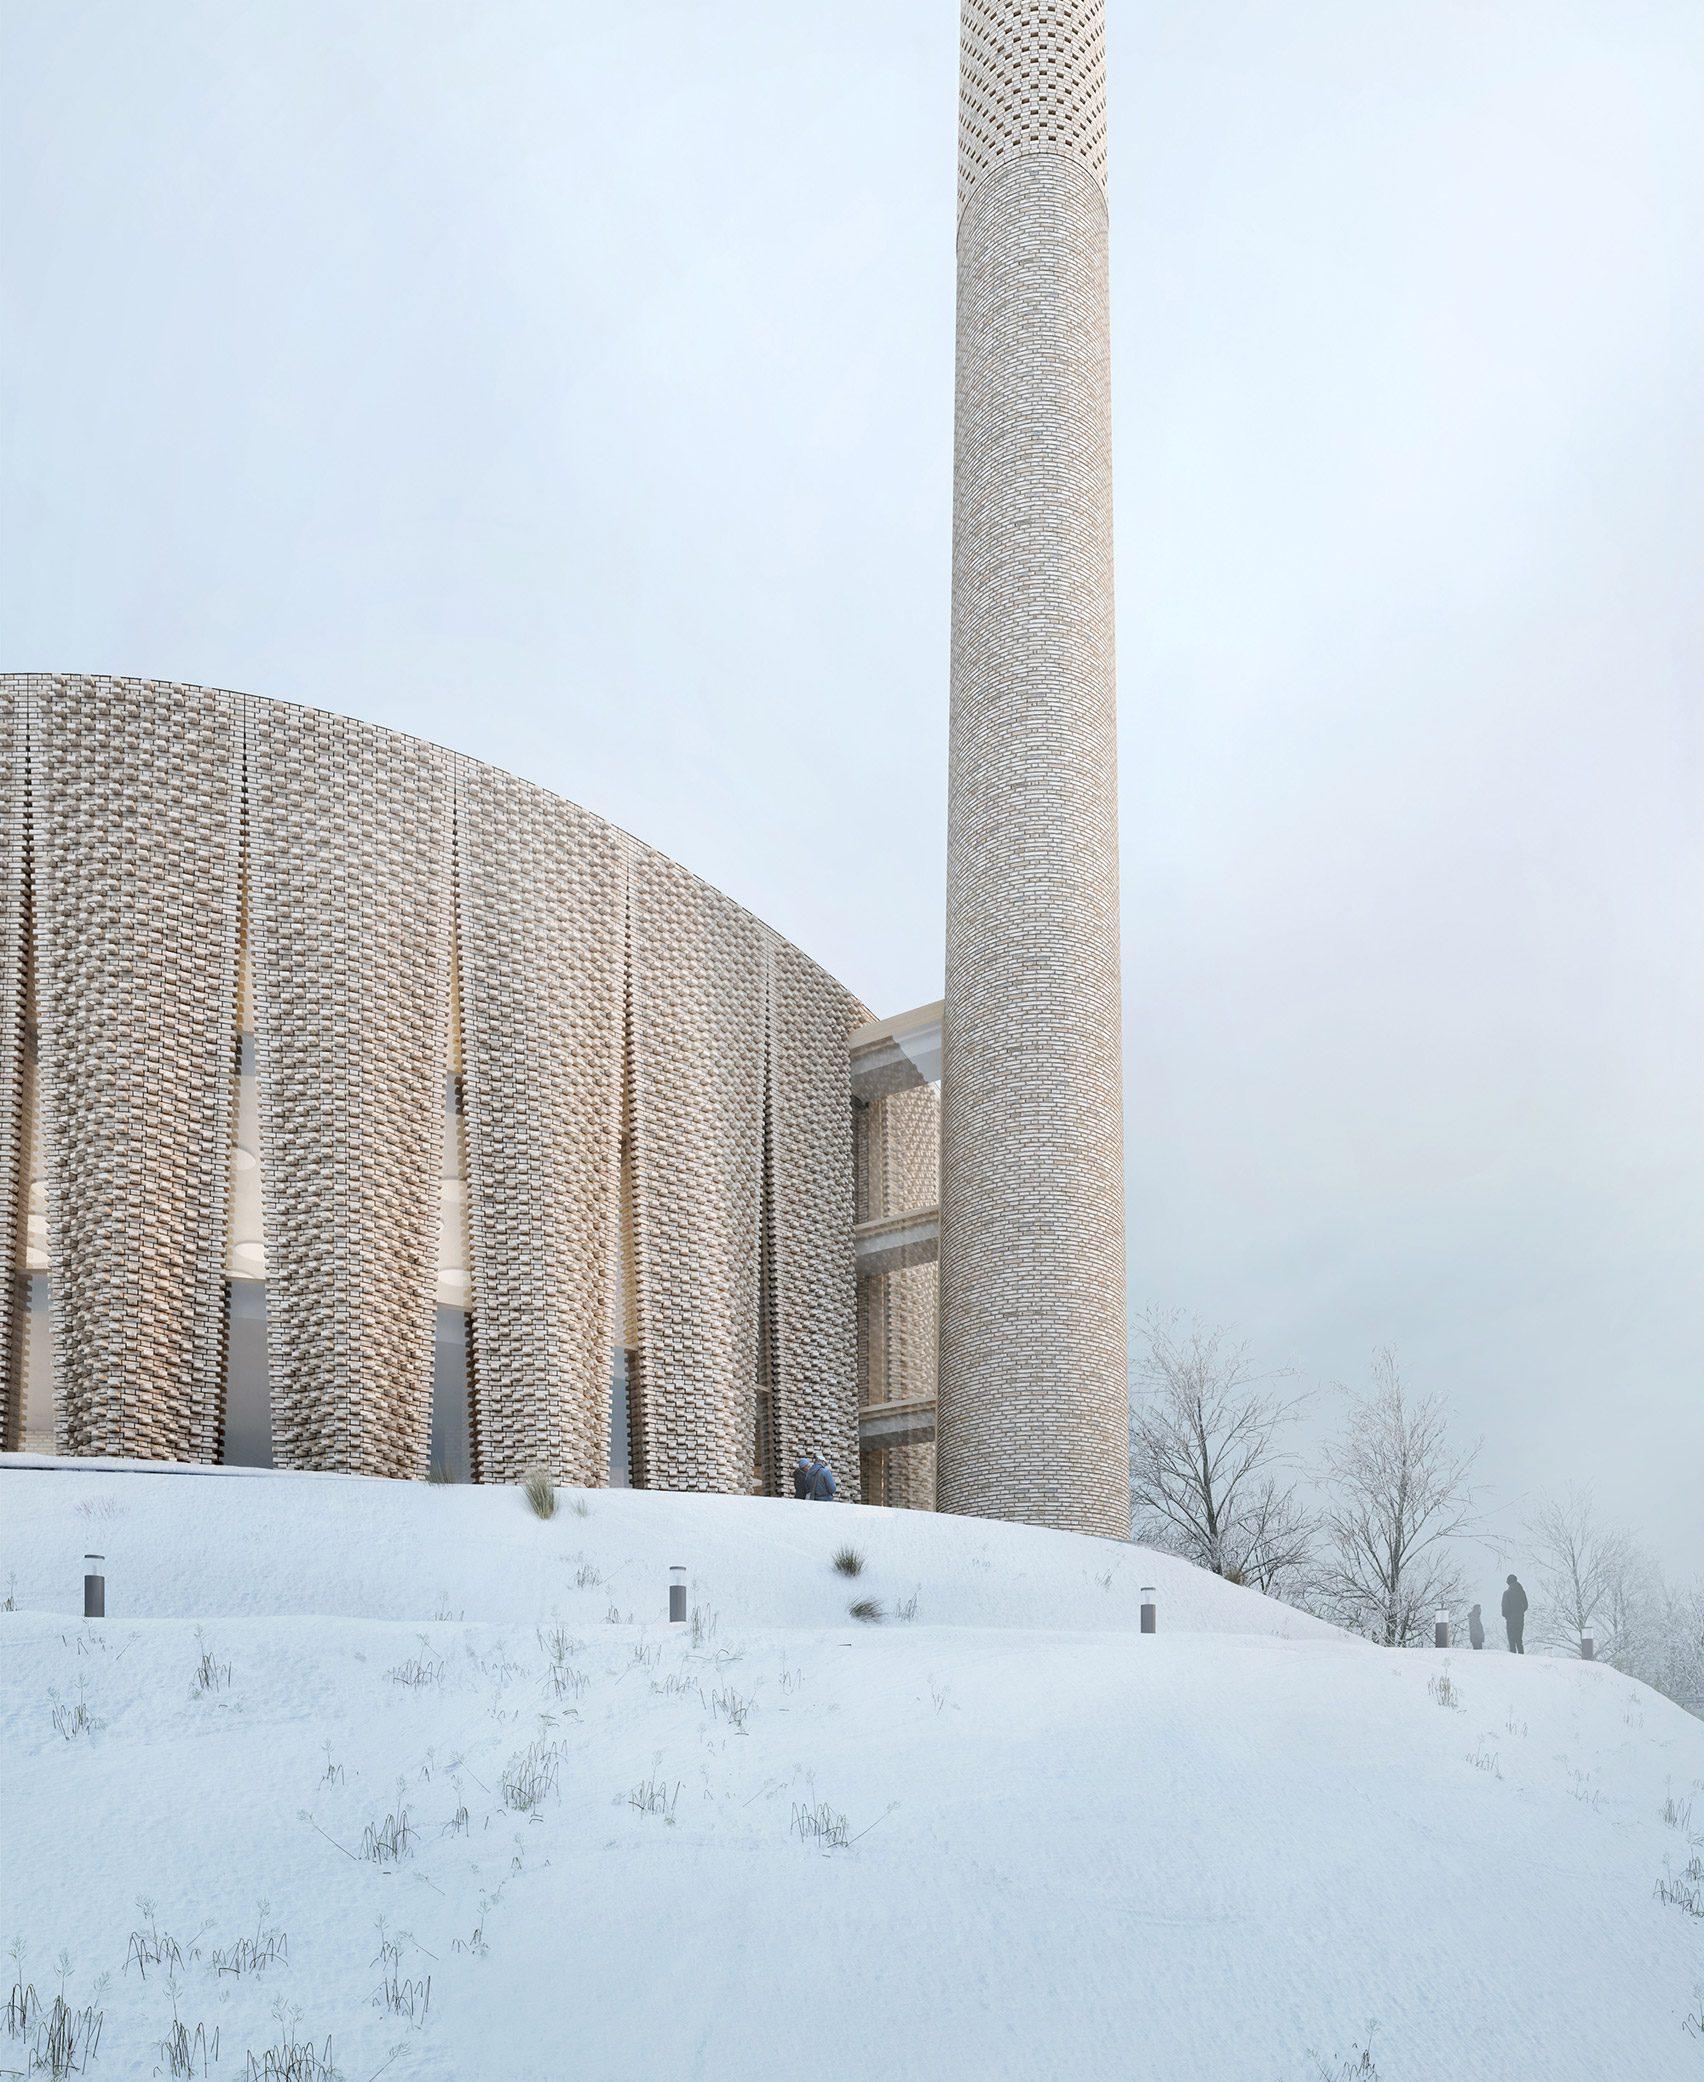 A render of the Brick Veil mosque exterior